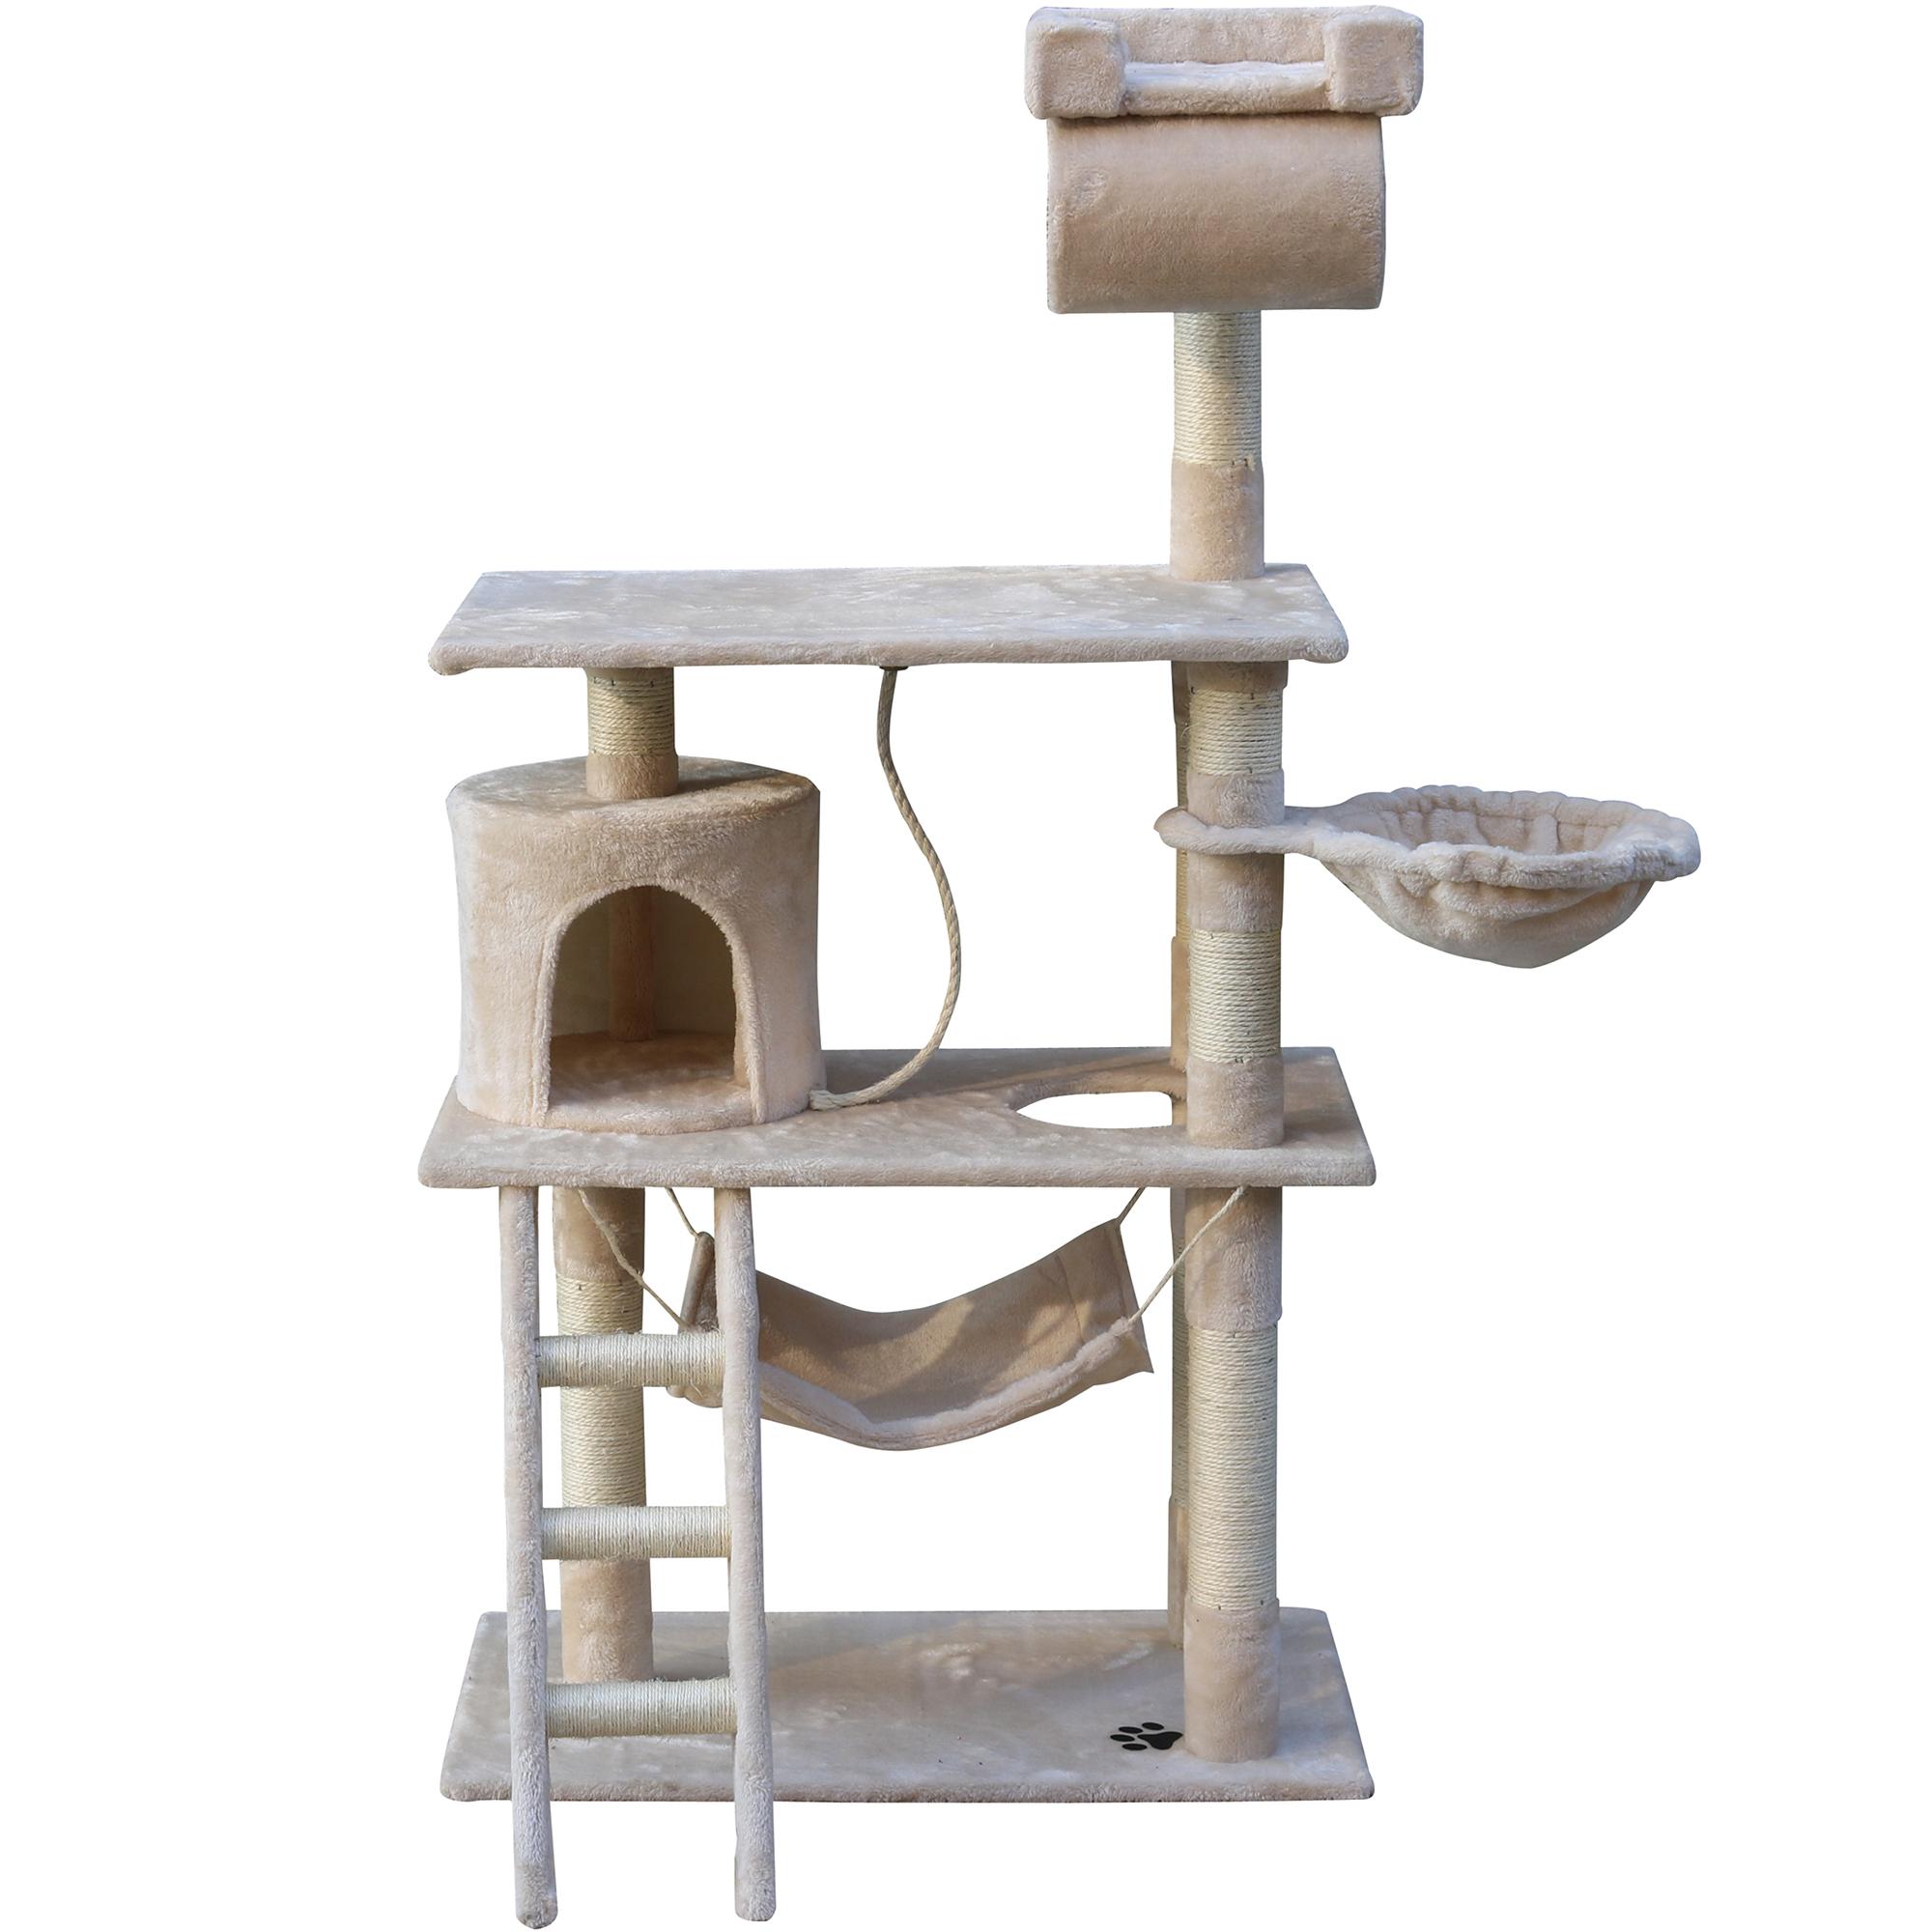 katzenkratzbaum katzenbaum kletterbaum kratzbaum baum f r katzen sisal 140 cm ebay. Black Bedroom Furniture Sets. Home Design Ideas